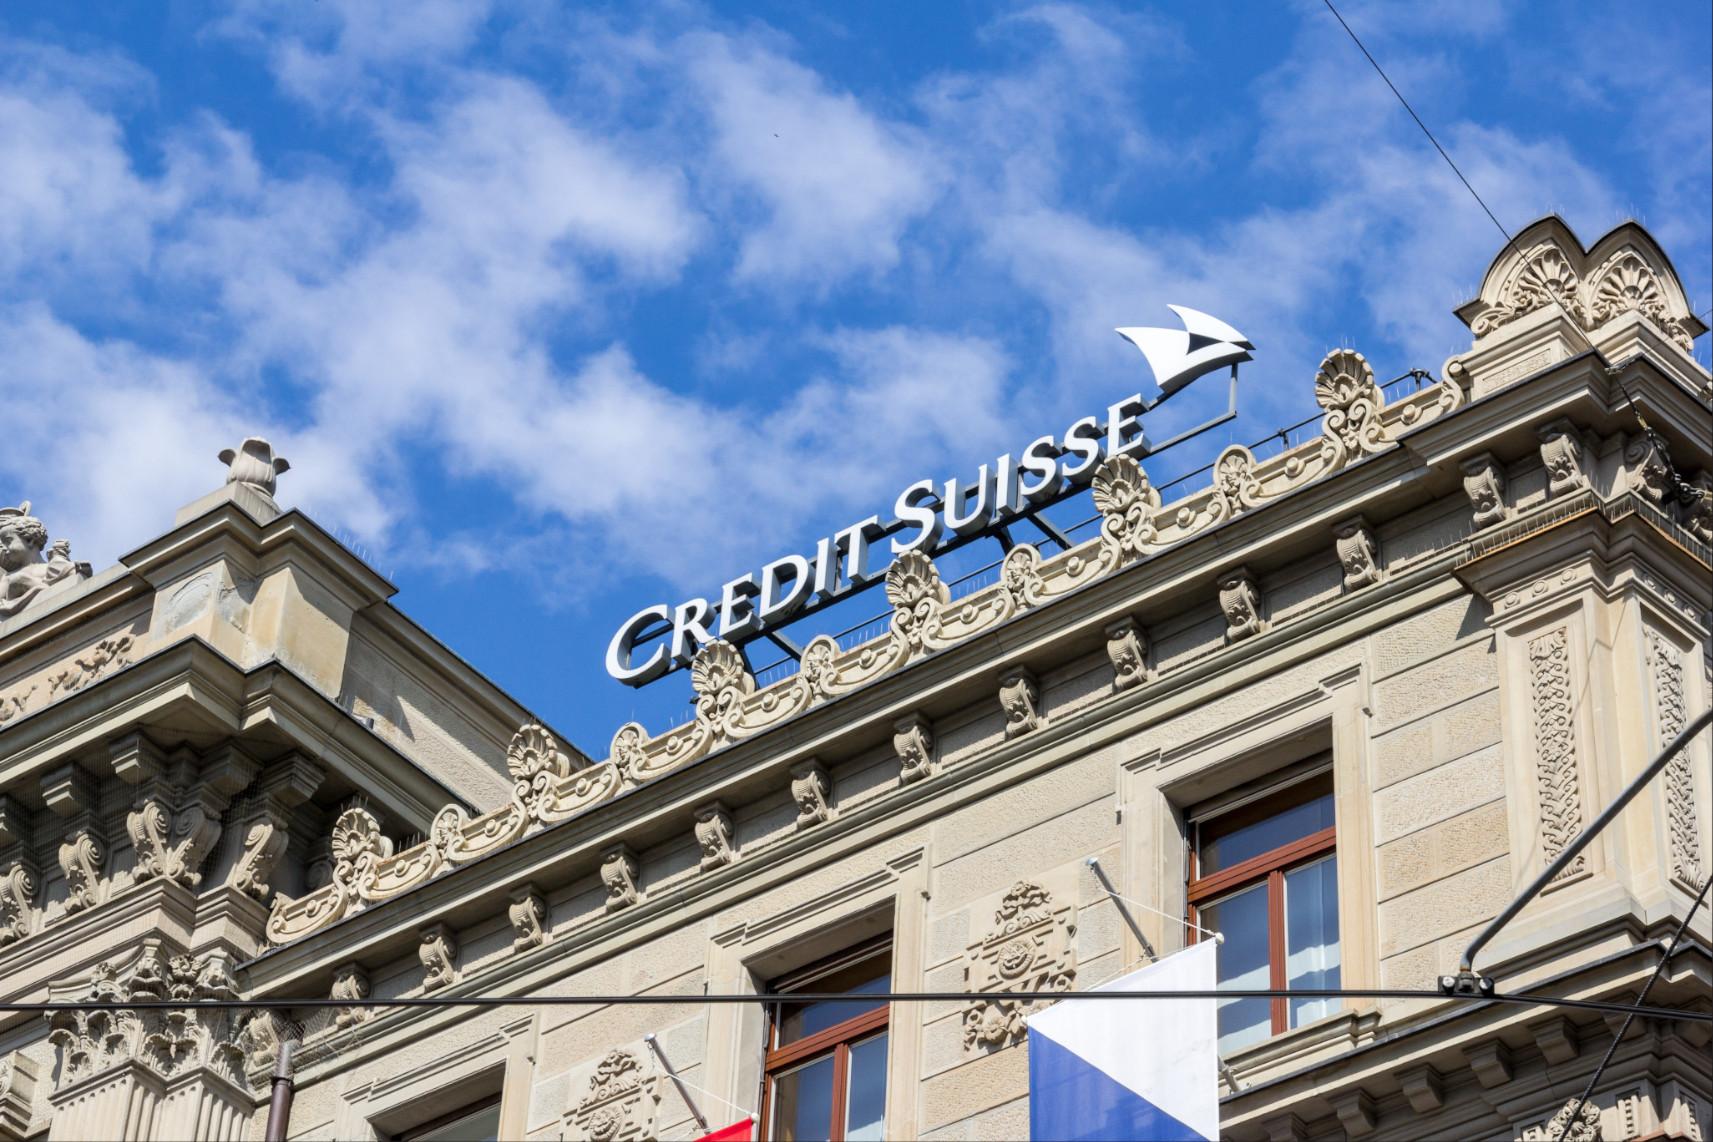 image Zurich,,Switzerland,-,April,19,,2021.,Credit,Suisse,In,The